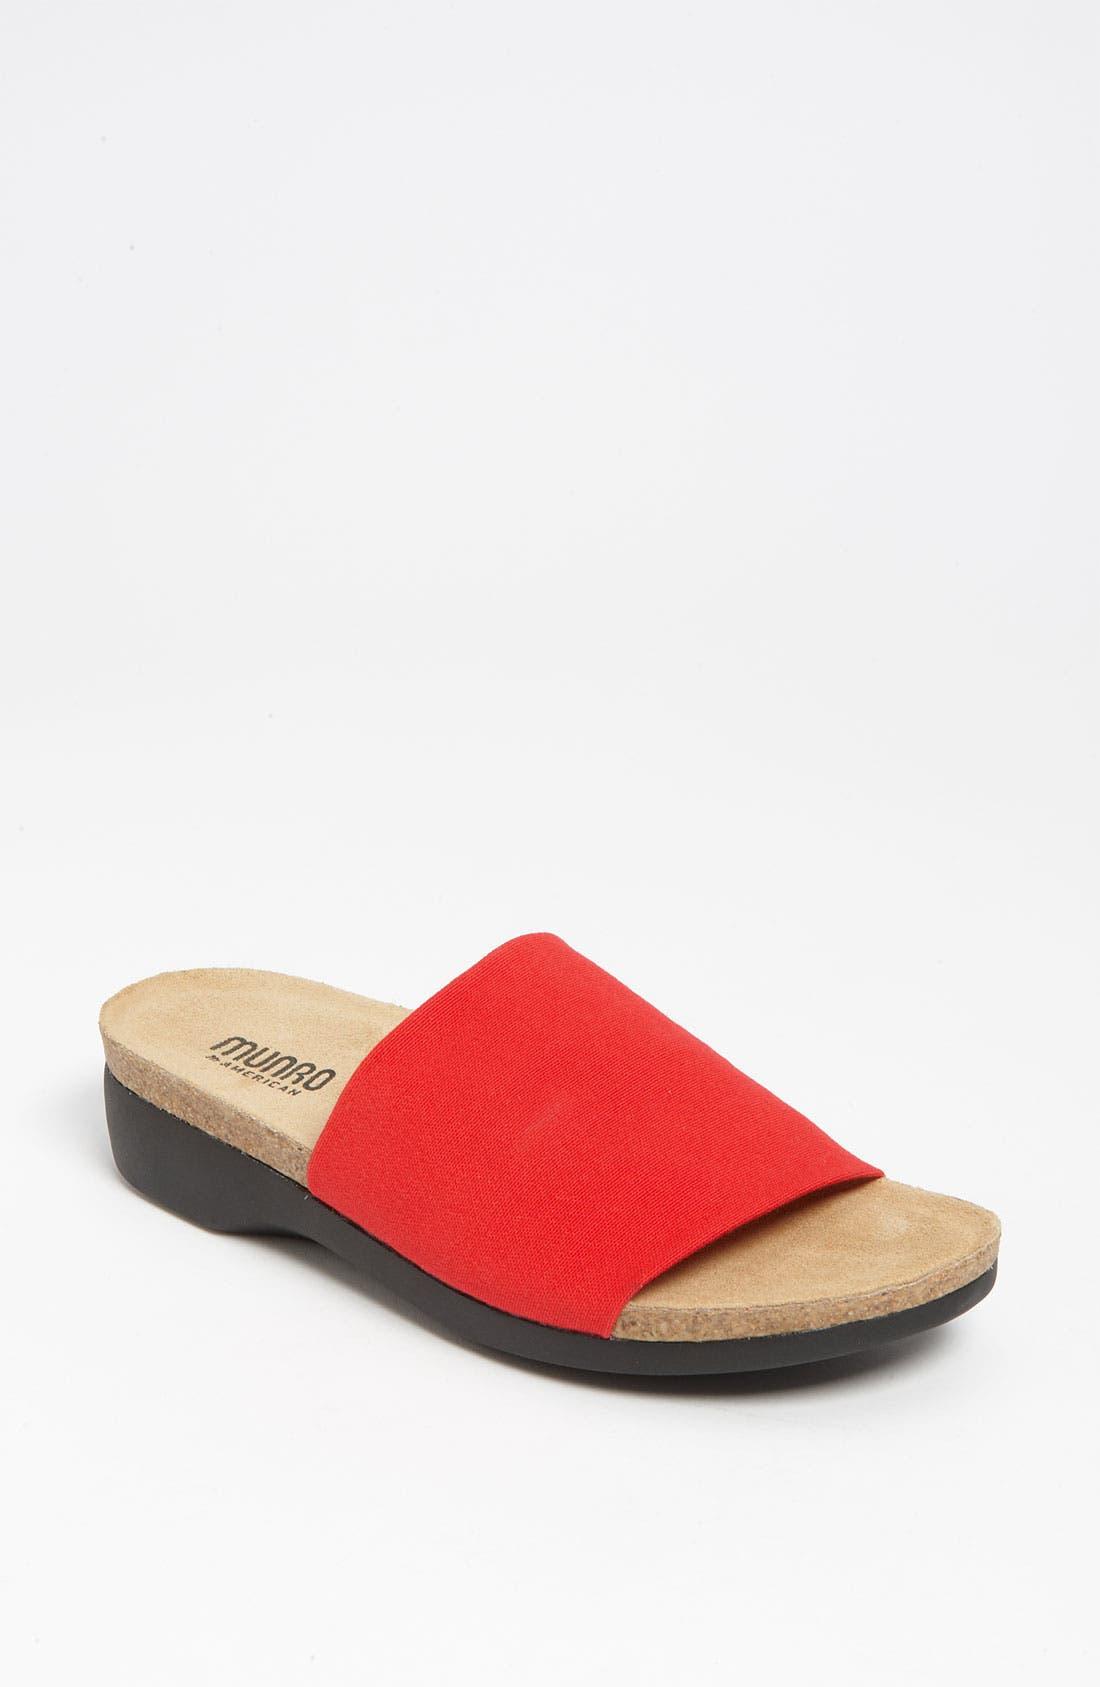 Main Image - Munro 'Aquarius' Sandal